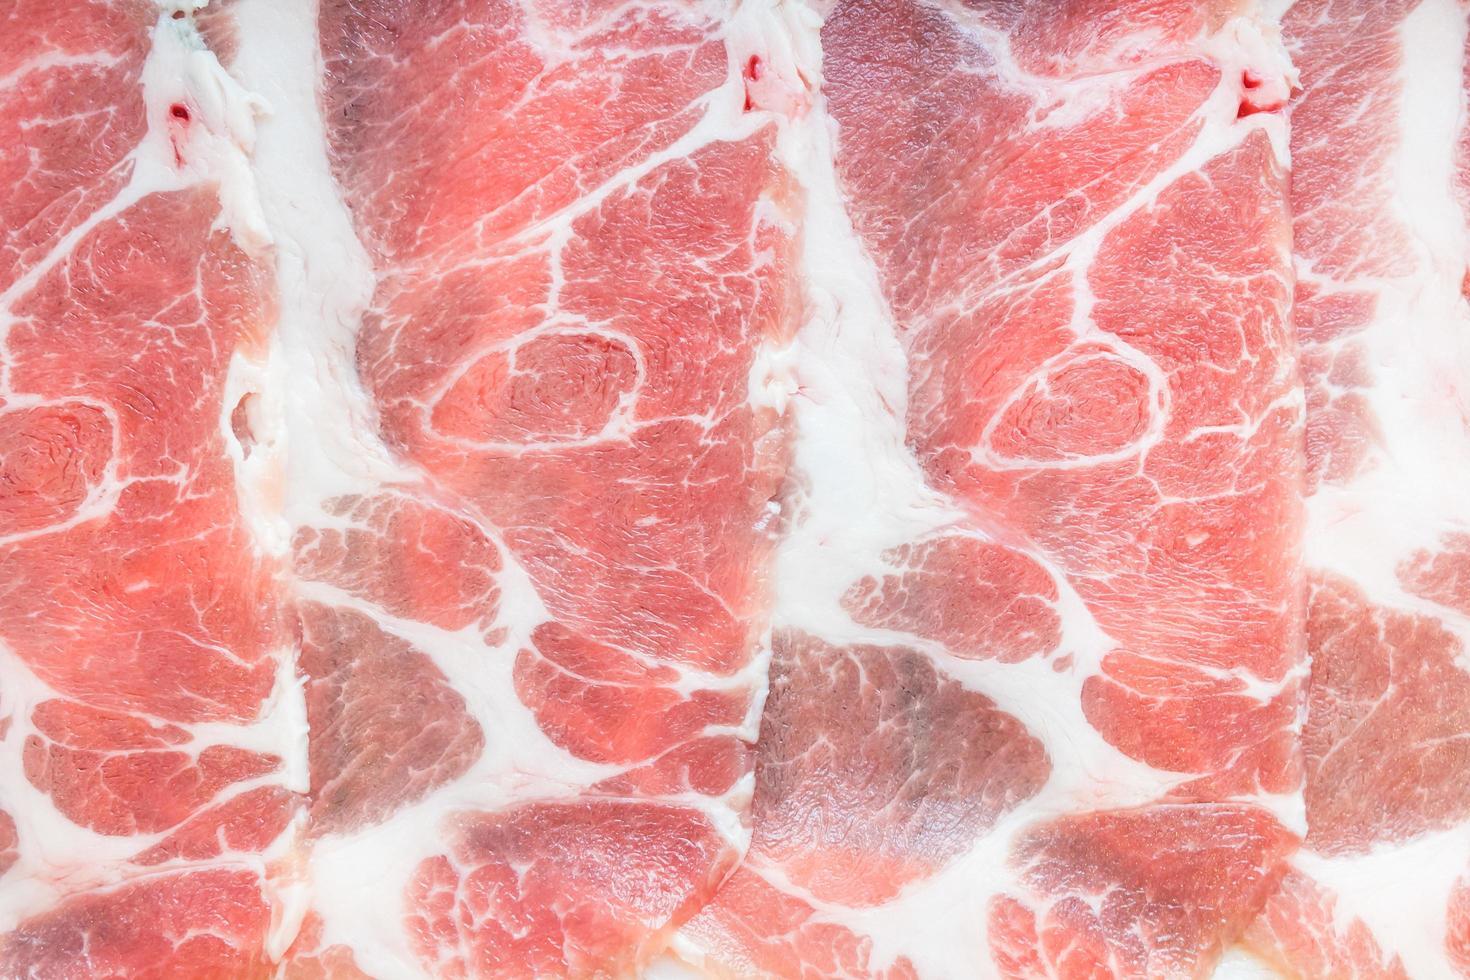 rauw varkensvlees foto